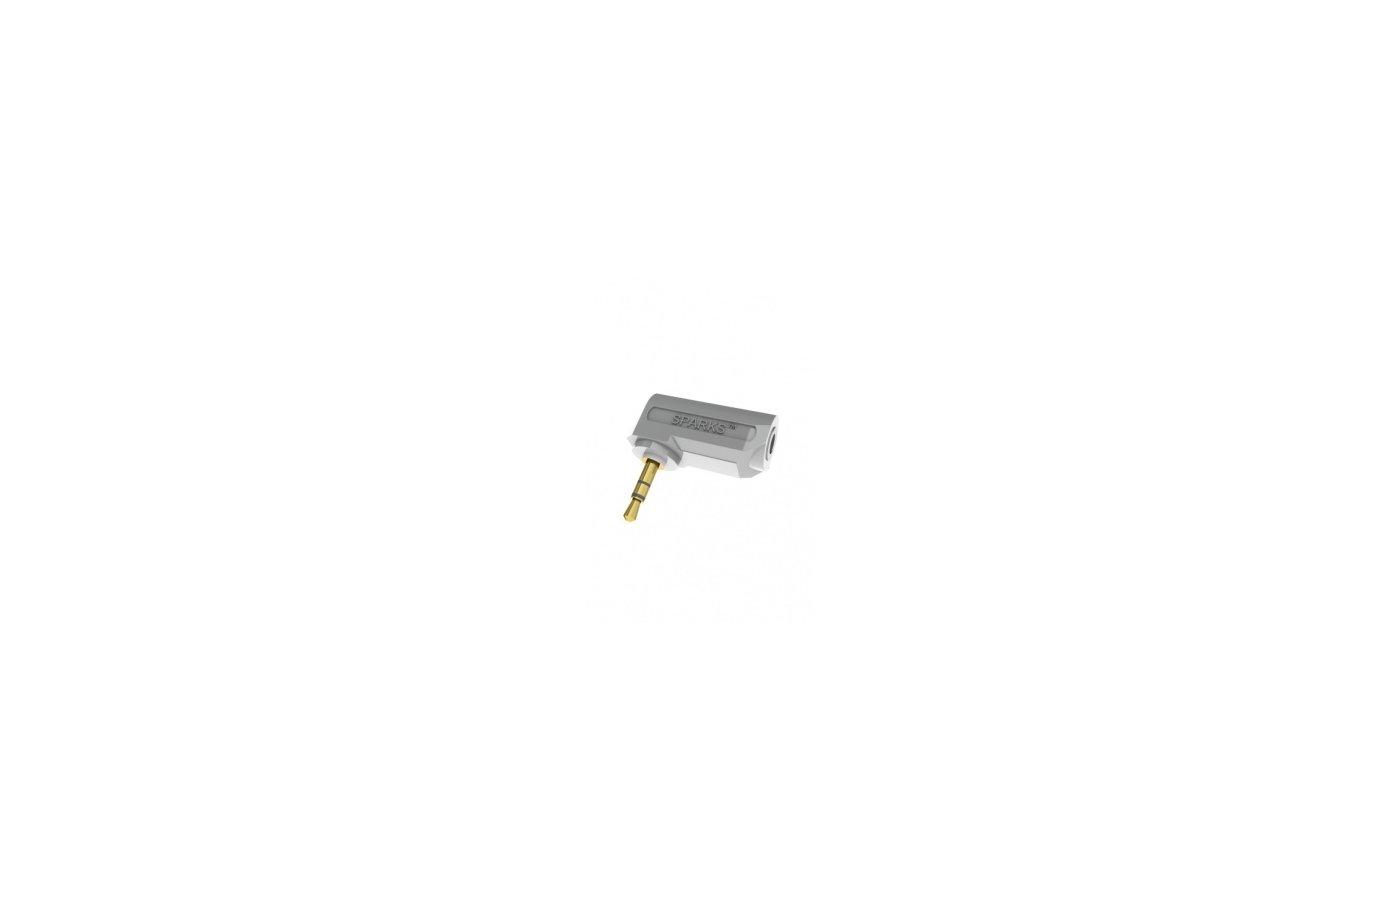 Переходник SPARKS SG 1106 Jack 2.5(f) - Jack 3.5(m)